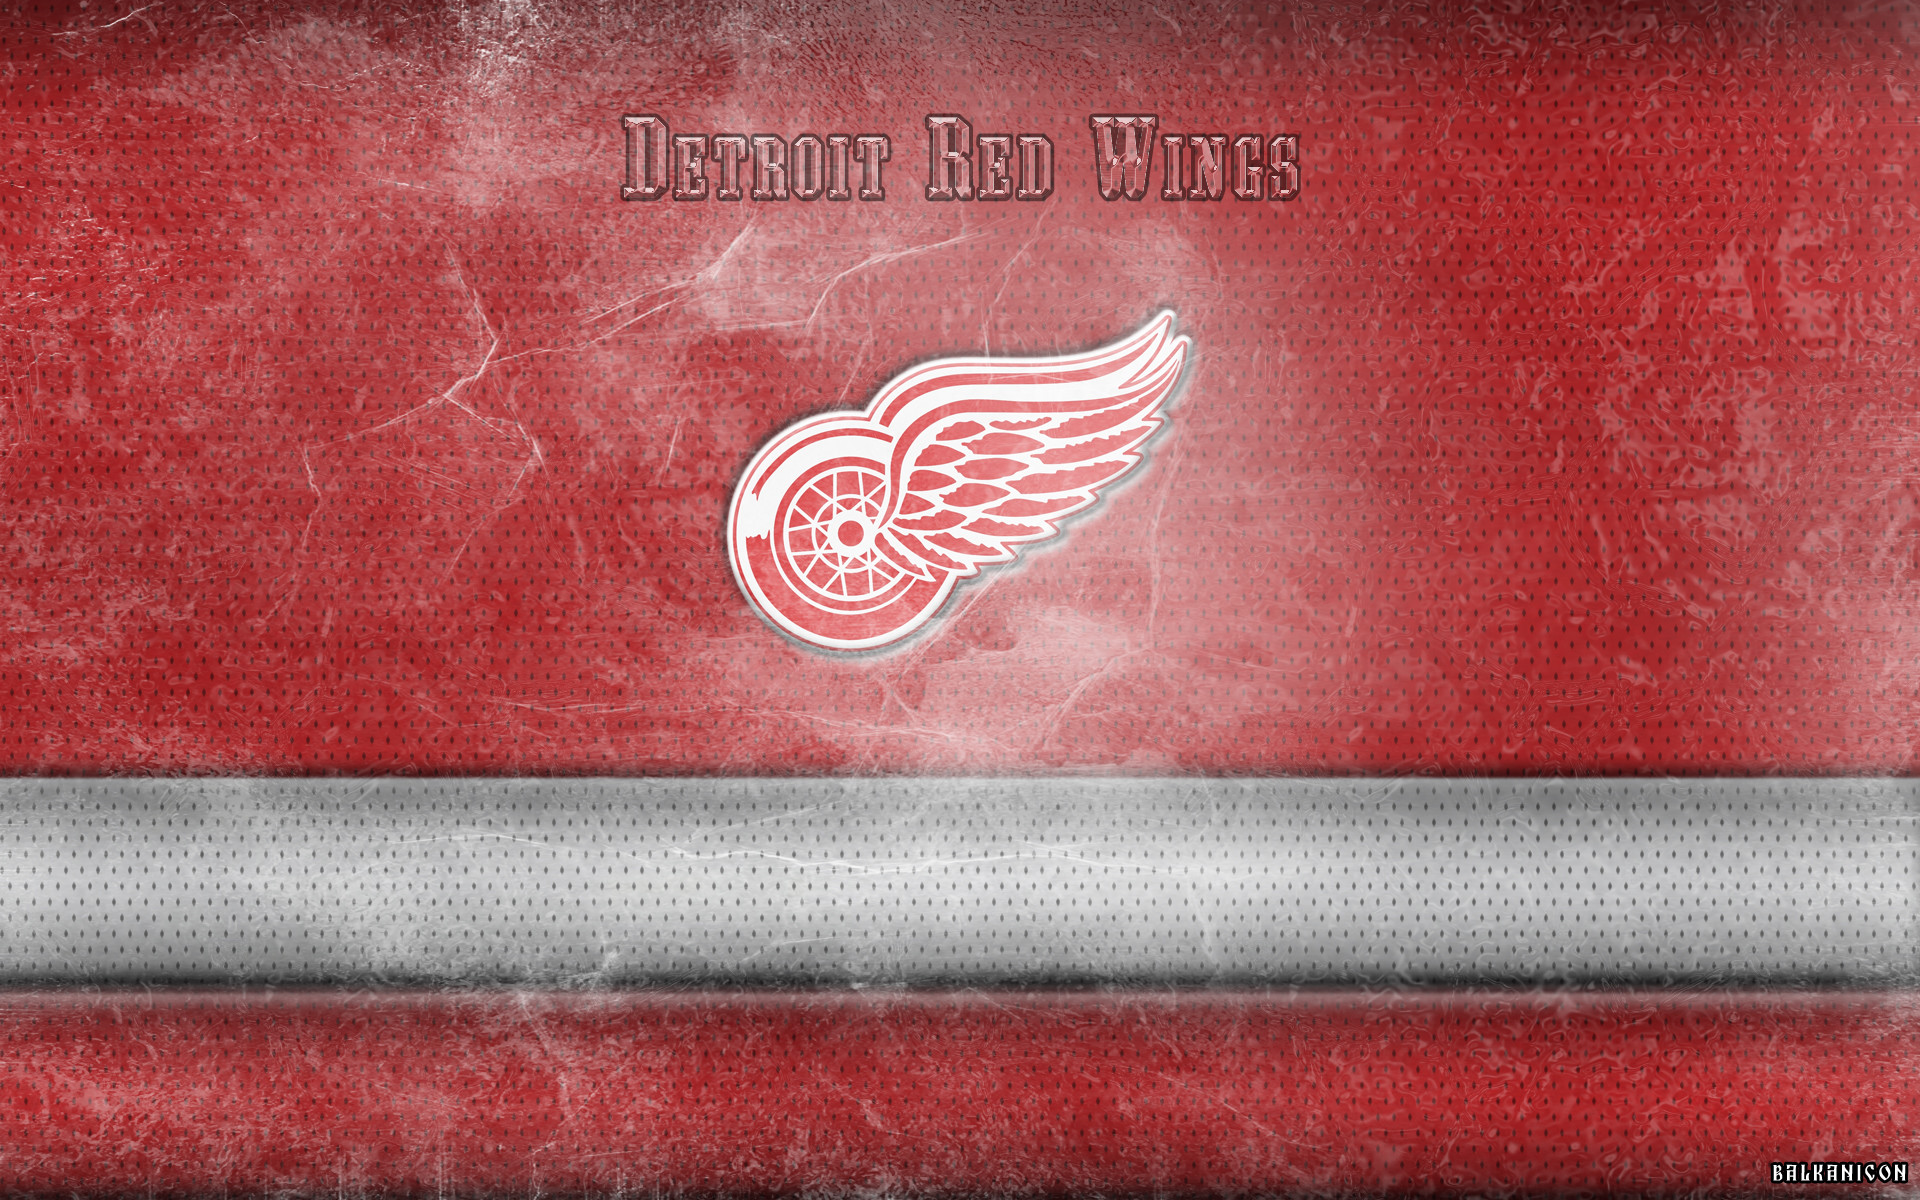 Detroit red wings wallpaper 1920x1200 detroit red wings wallpaper by balkanicon detroit red wings wallpaper by balkanicon voltagebd Gallery